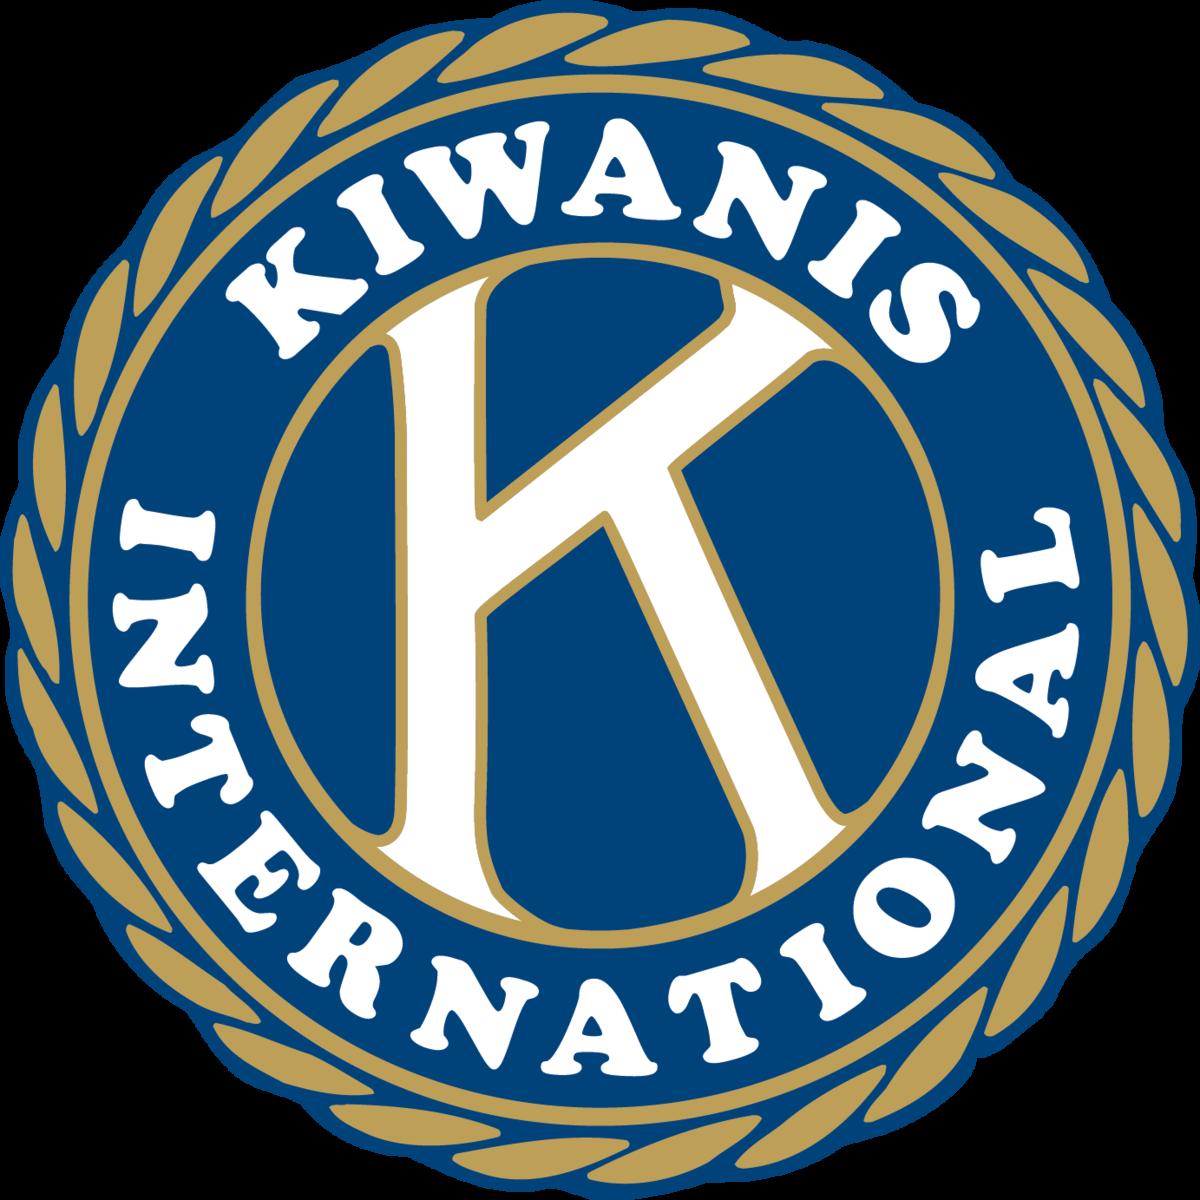 Kiwanas